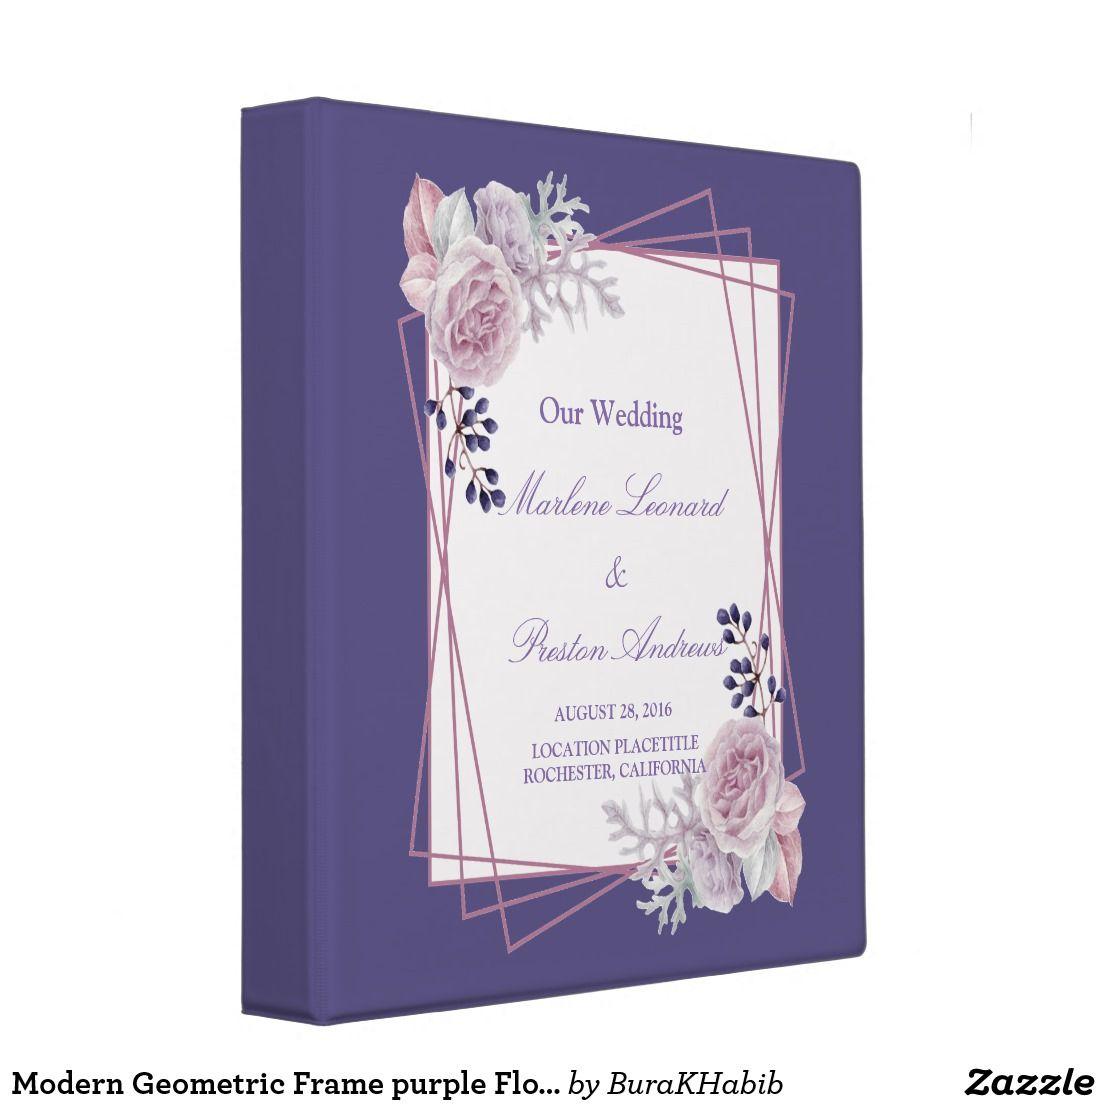 Modern Geometric Frame Purple Floral 3 Ring Binder